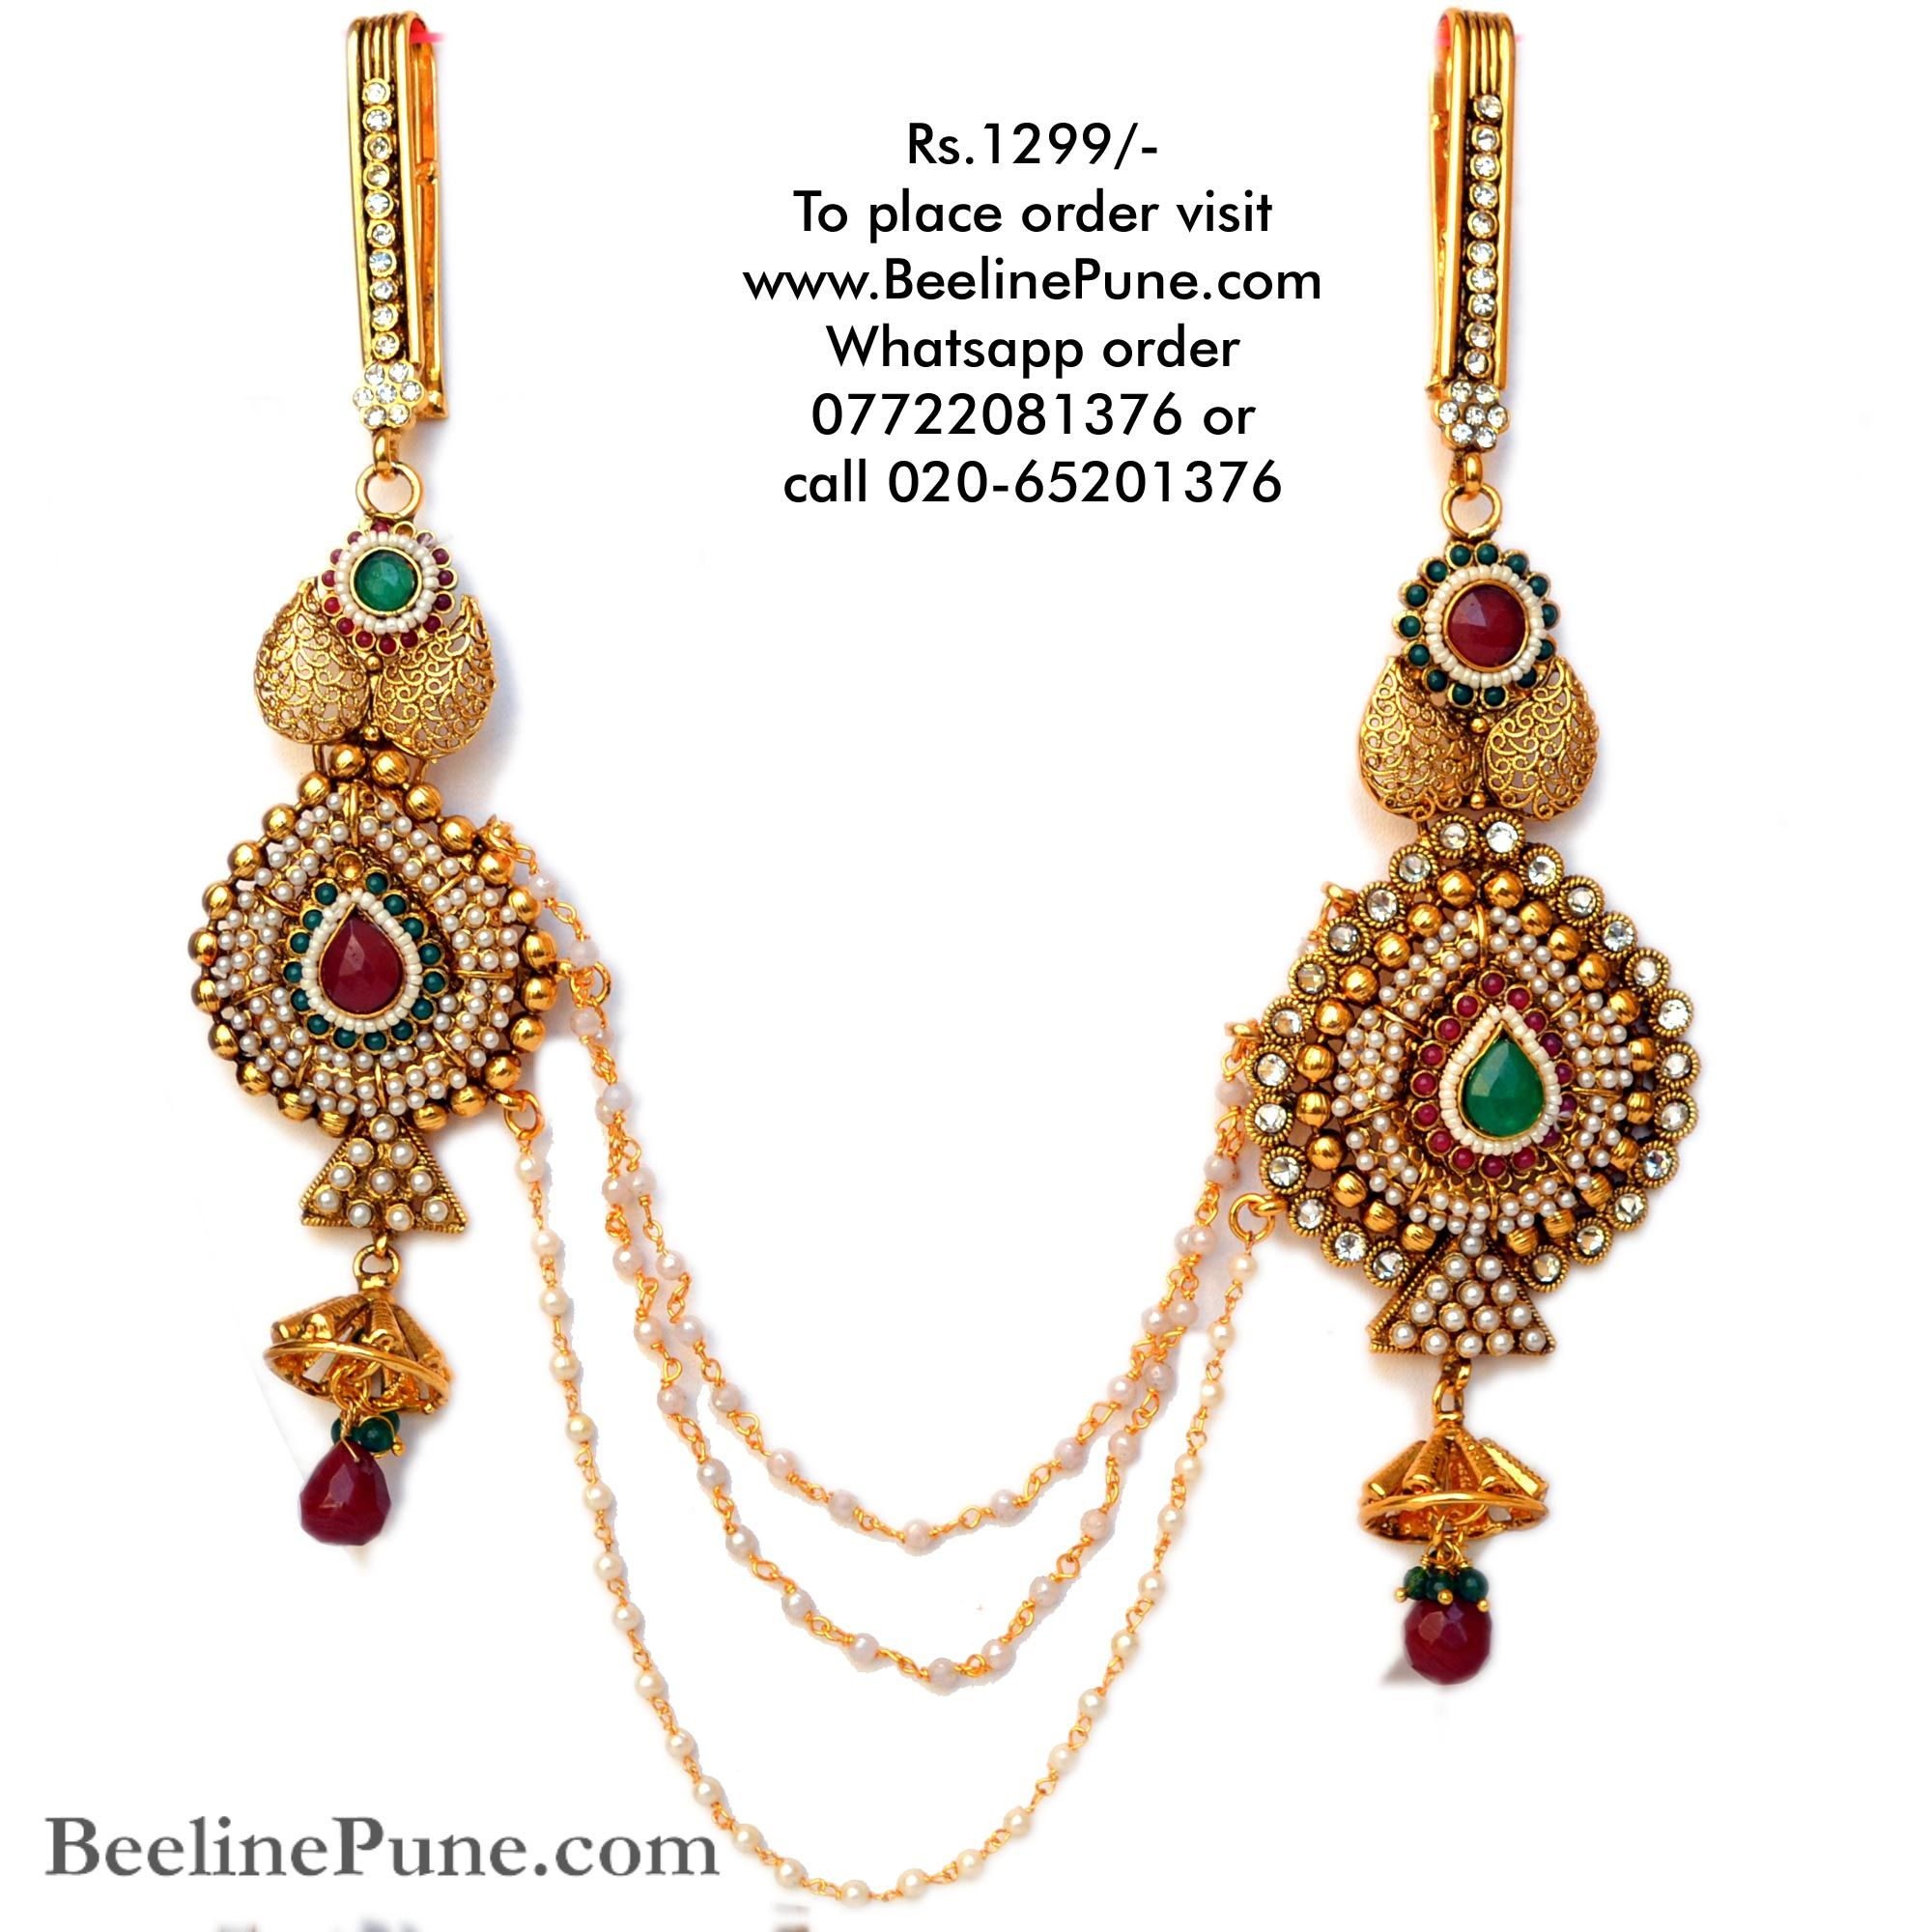 a0dc5557e Challa/Mekhla Saree Brooch, Waist Jewelry, Chain Belts, Key Chain, Ethnic